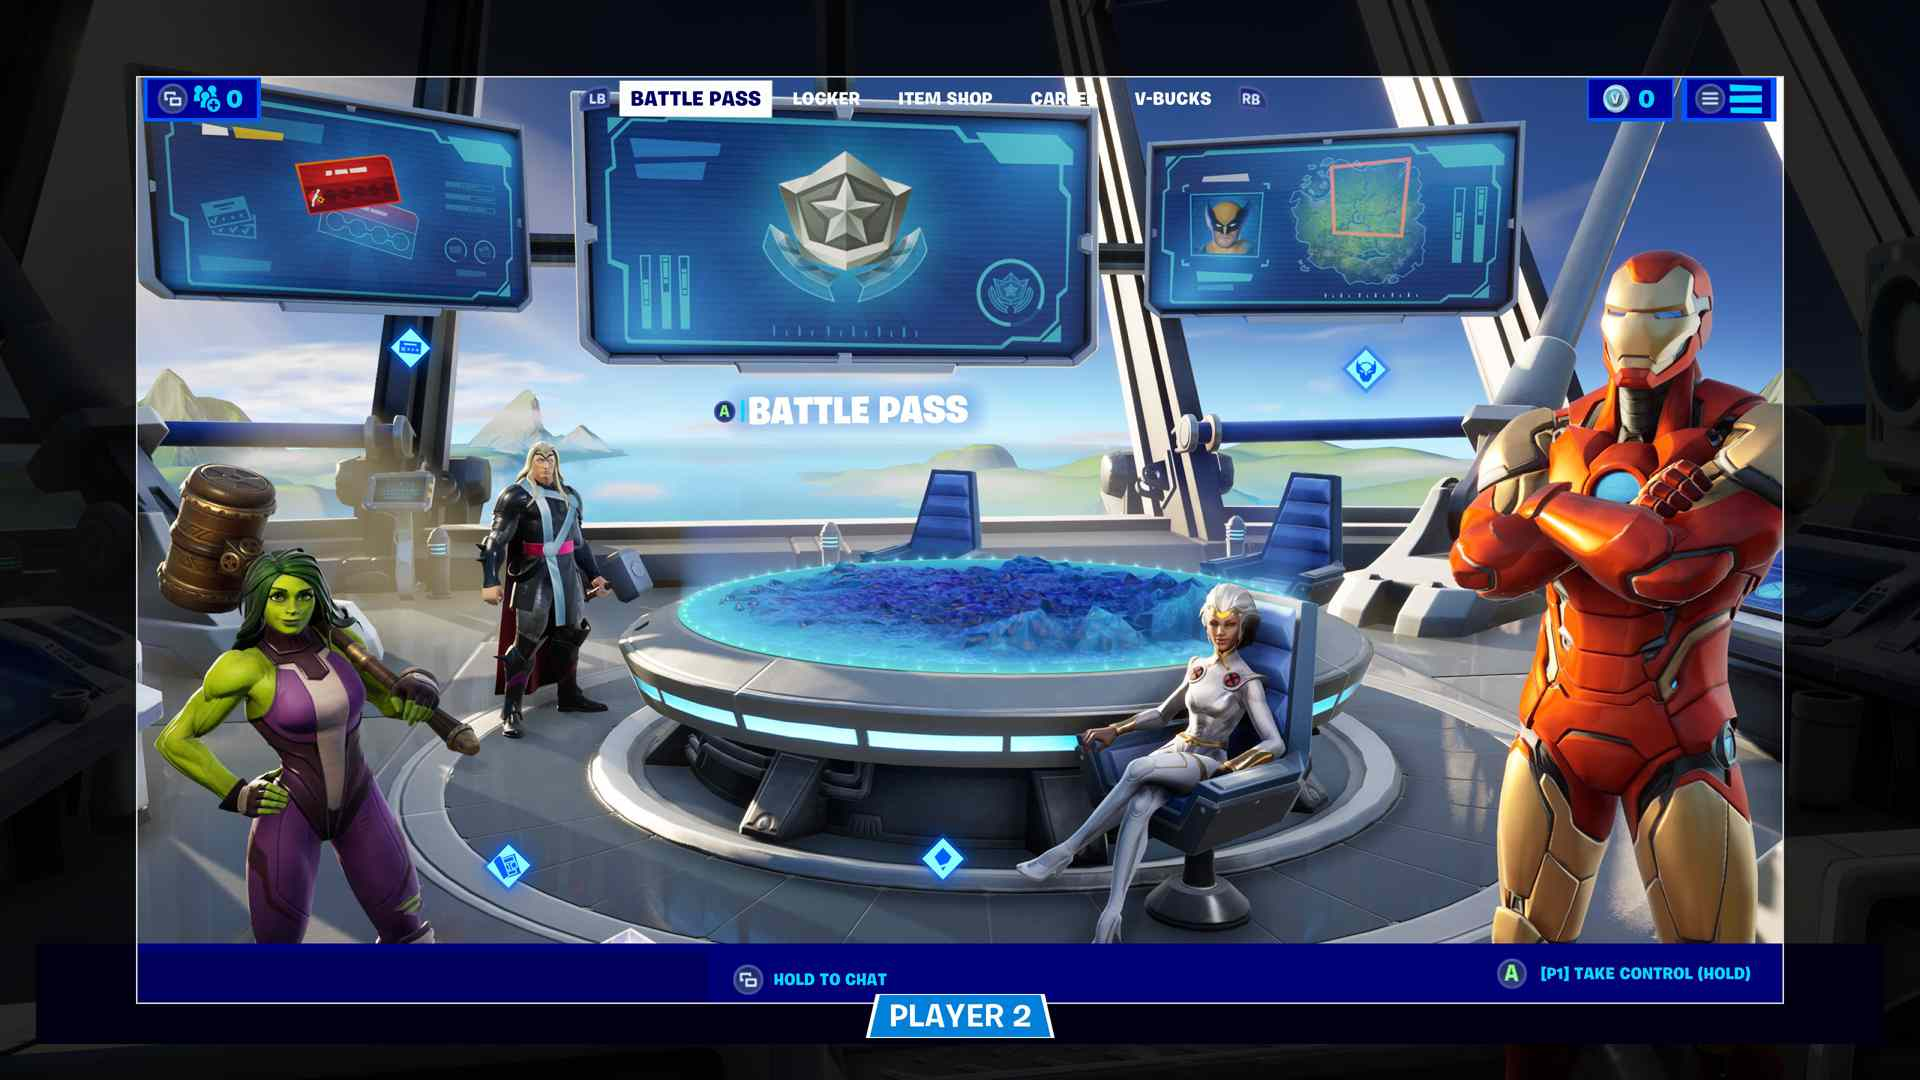 Player 2 using the menu in Fortnite.